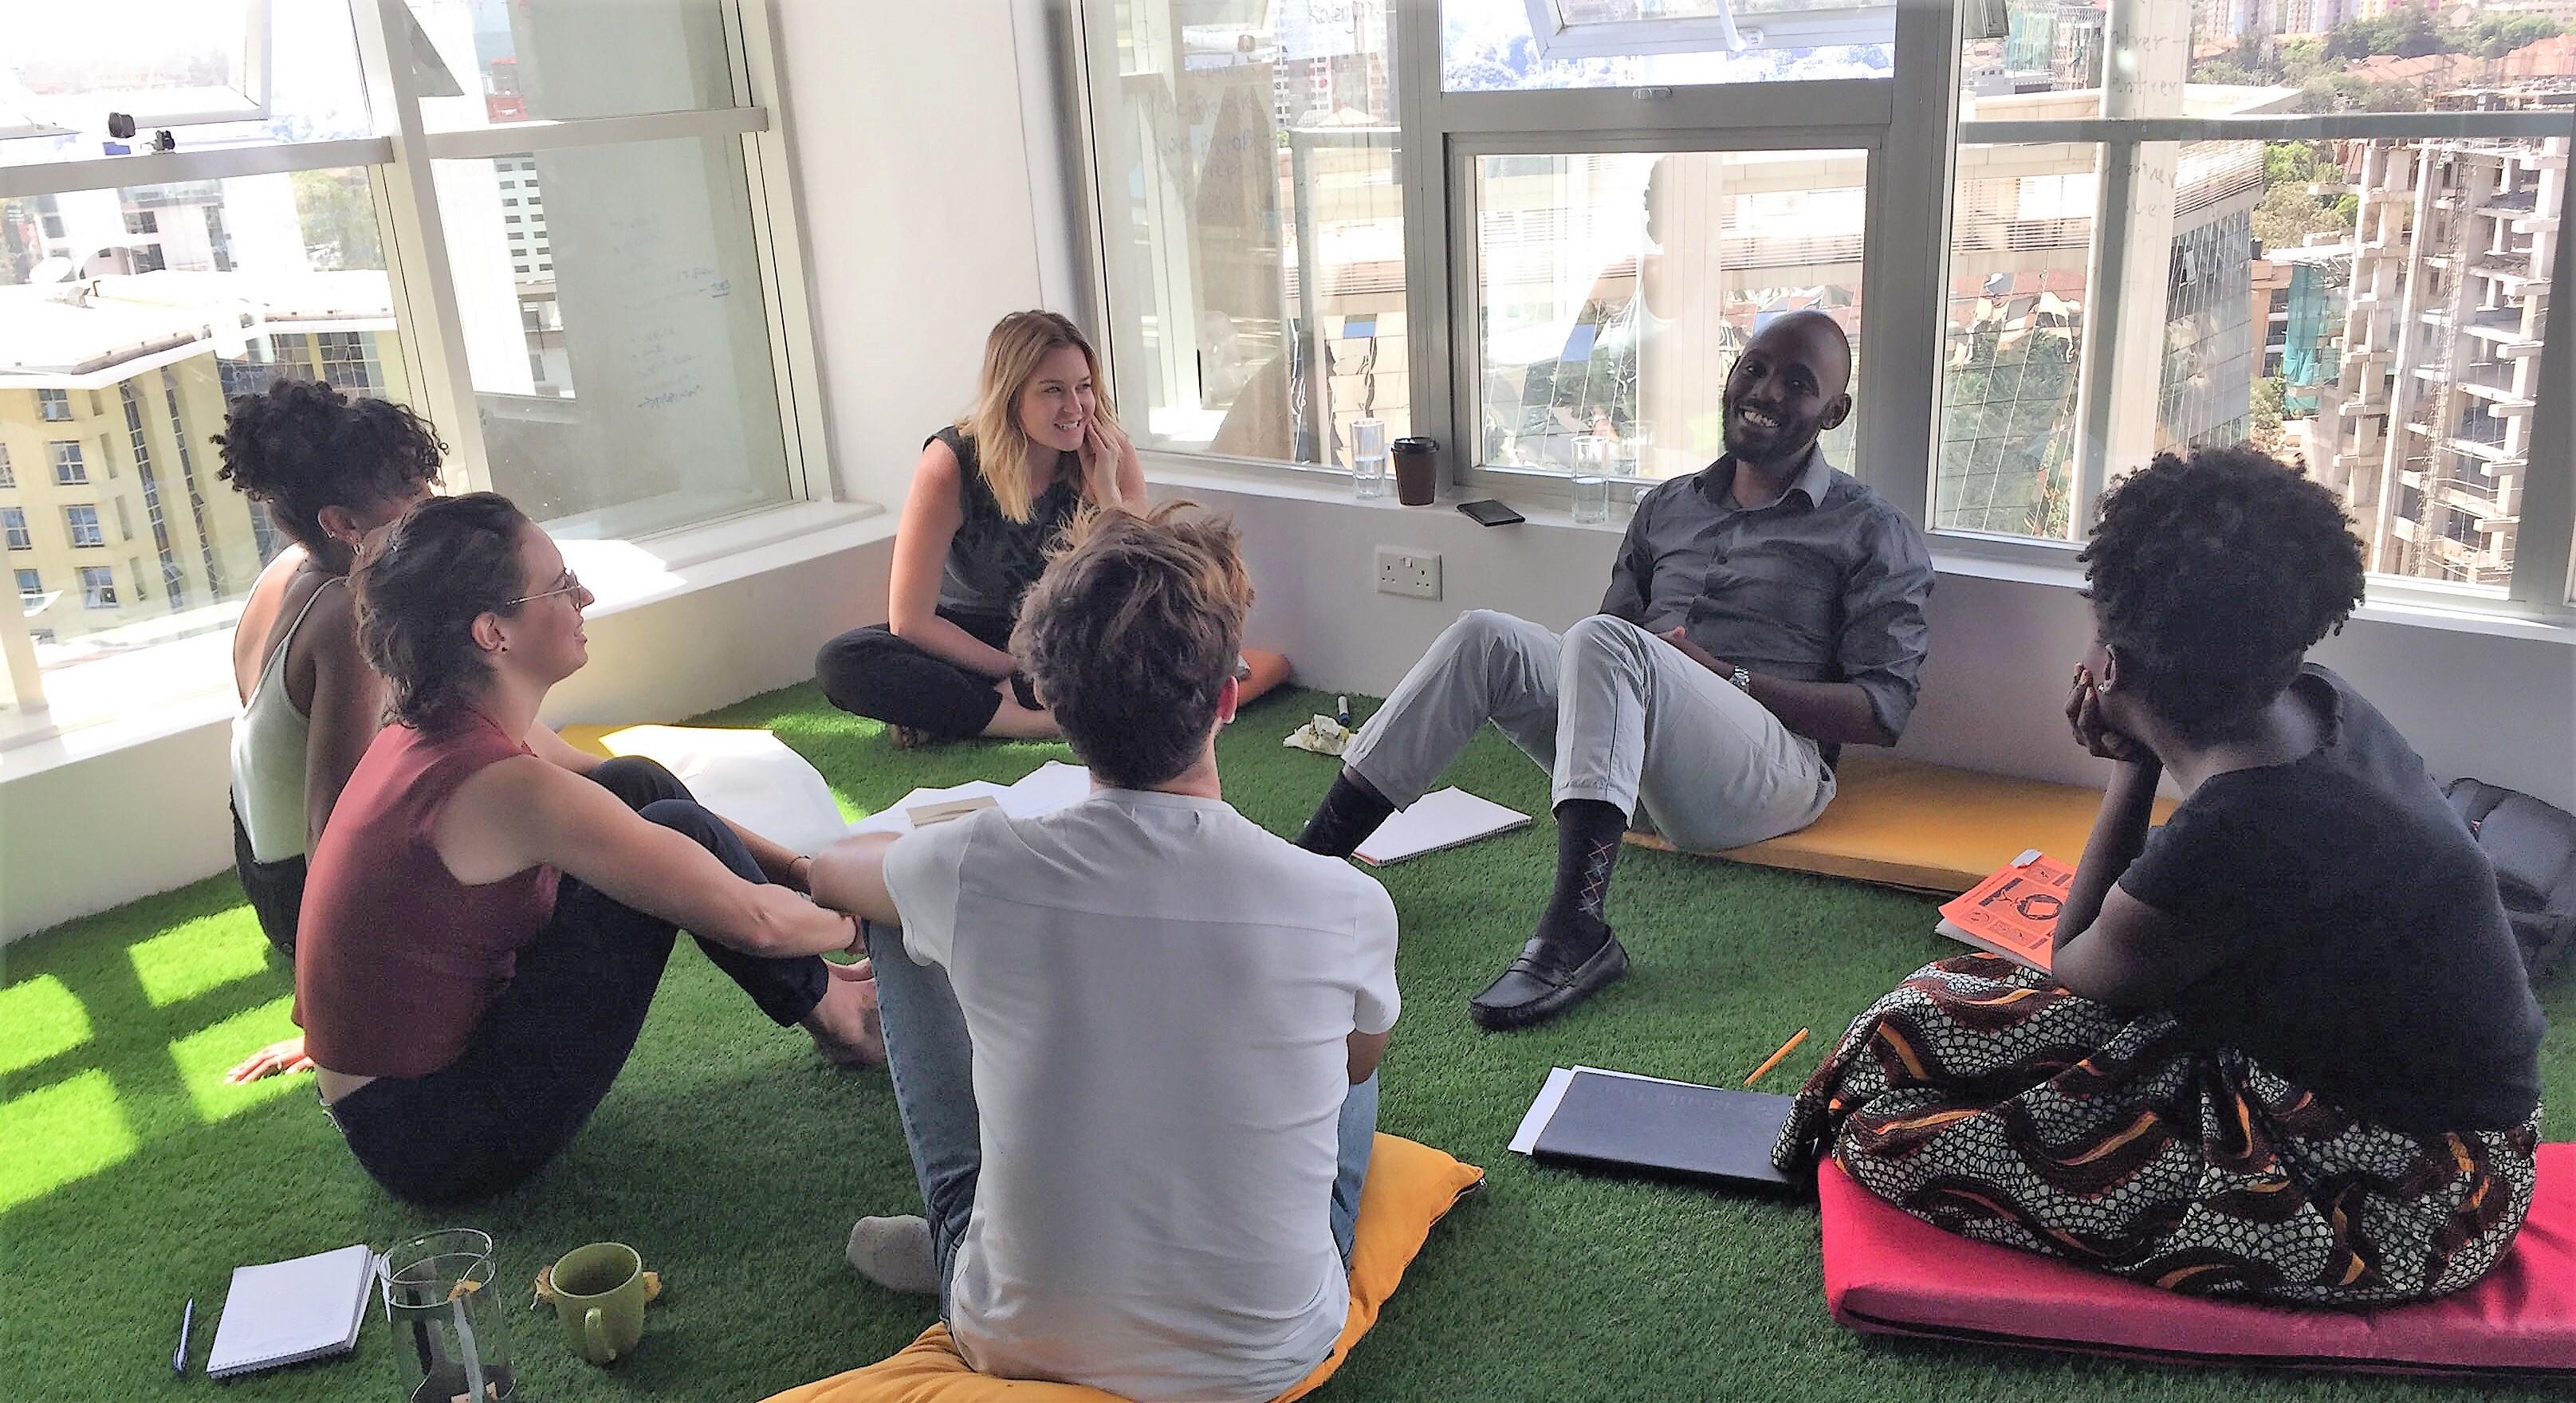 ThinkPlace Kenya staff take Swahili lessons in the Nairobi design studio